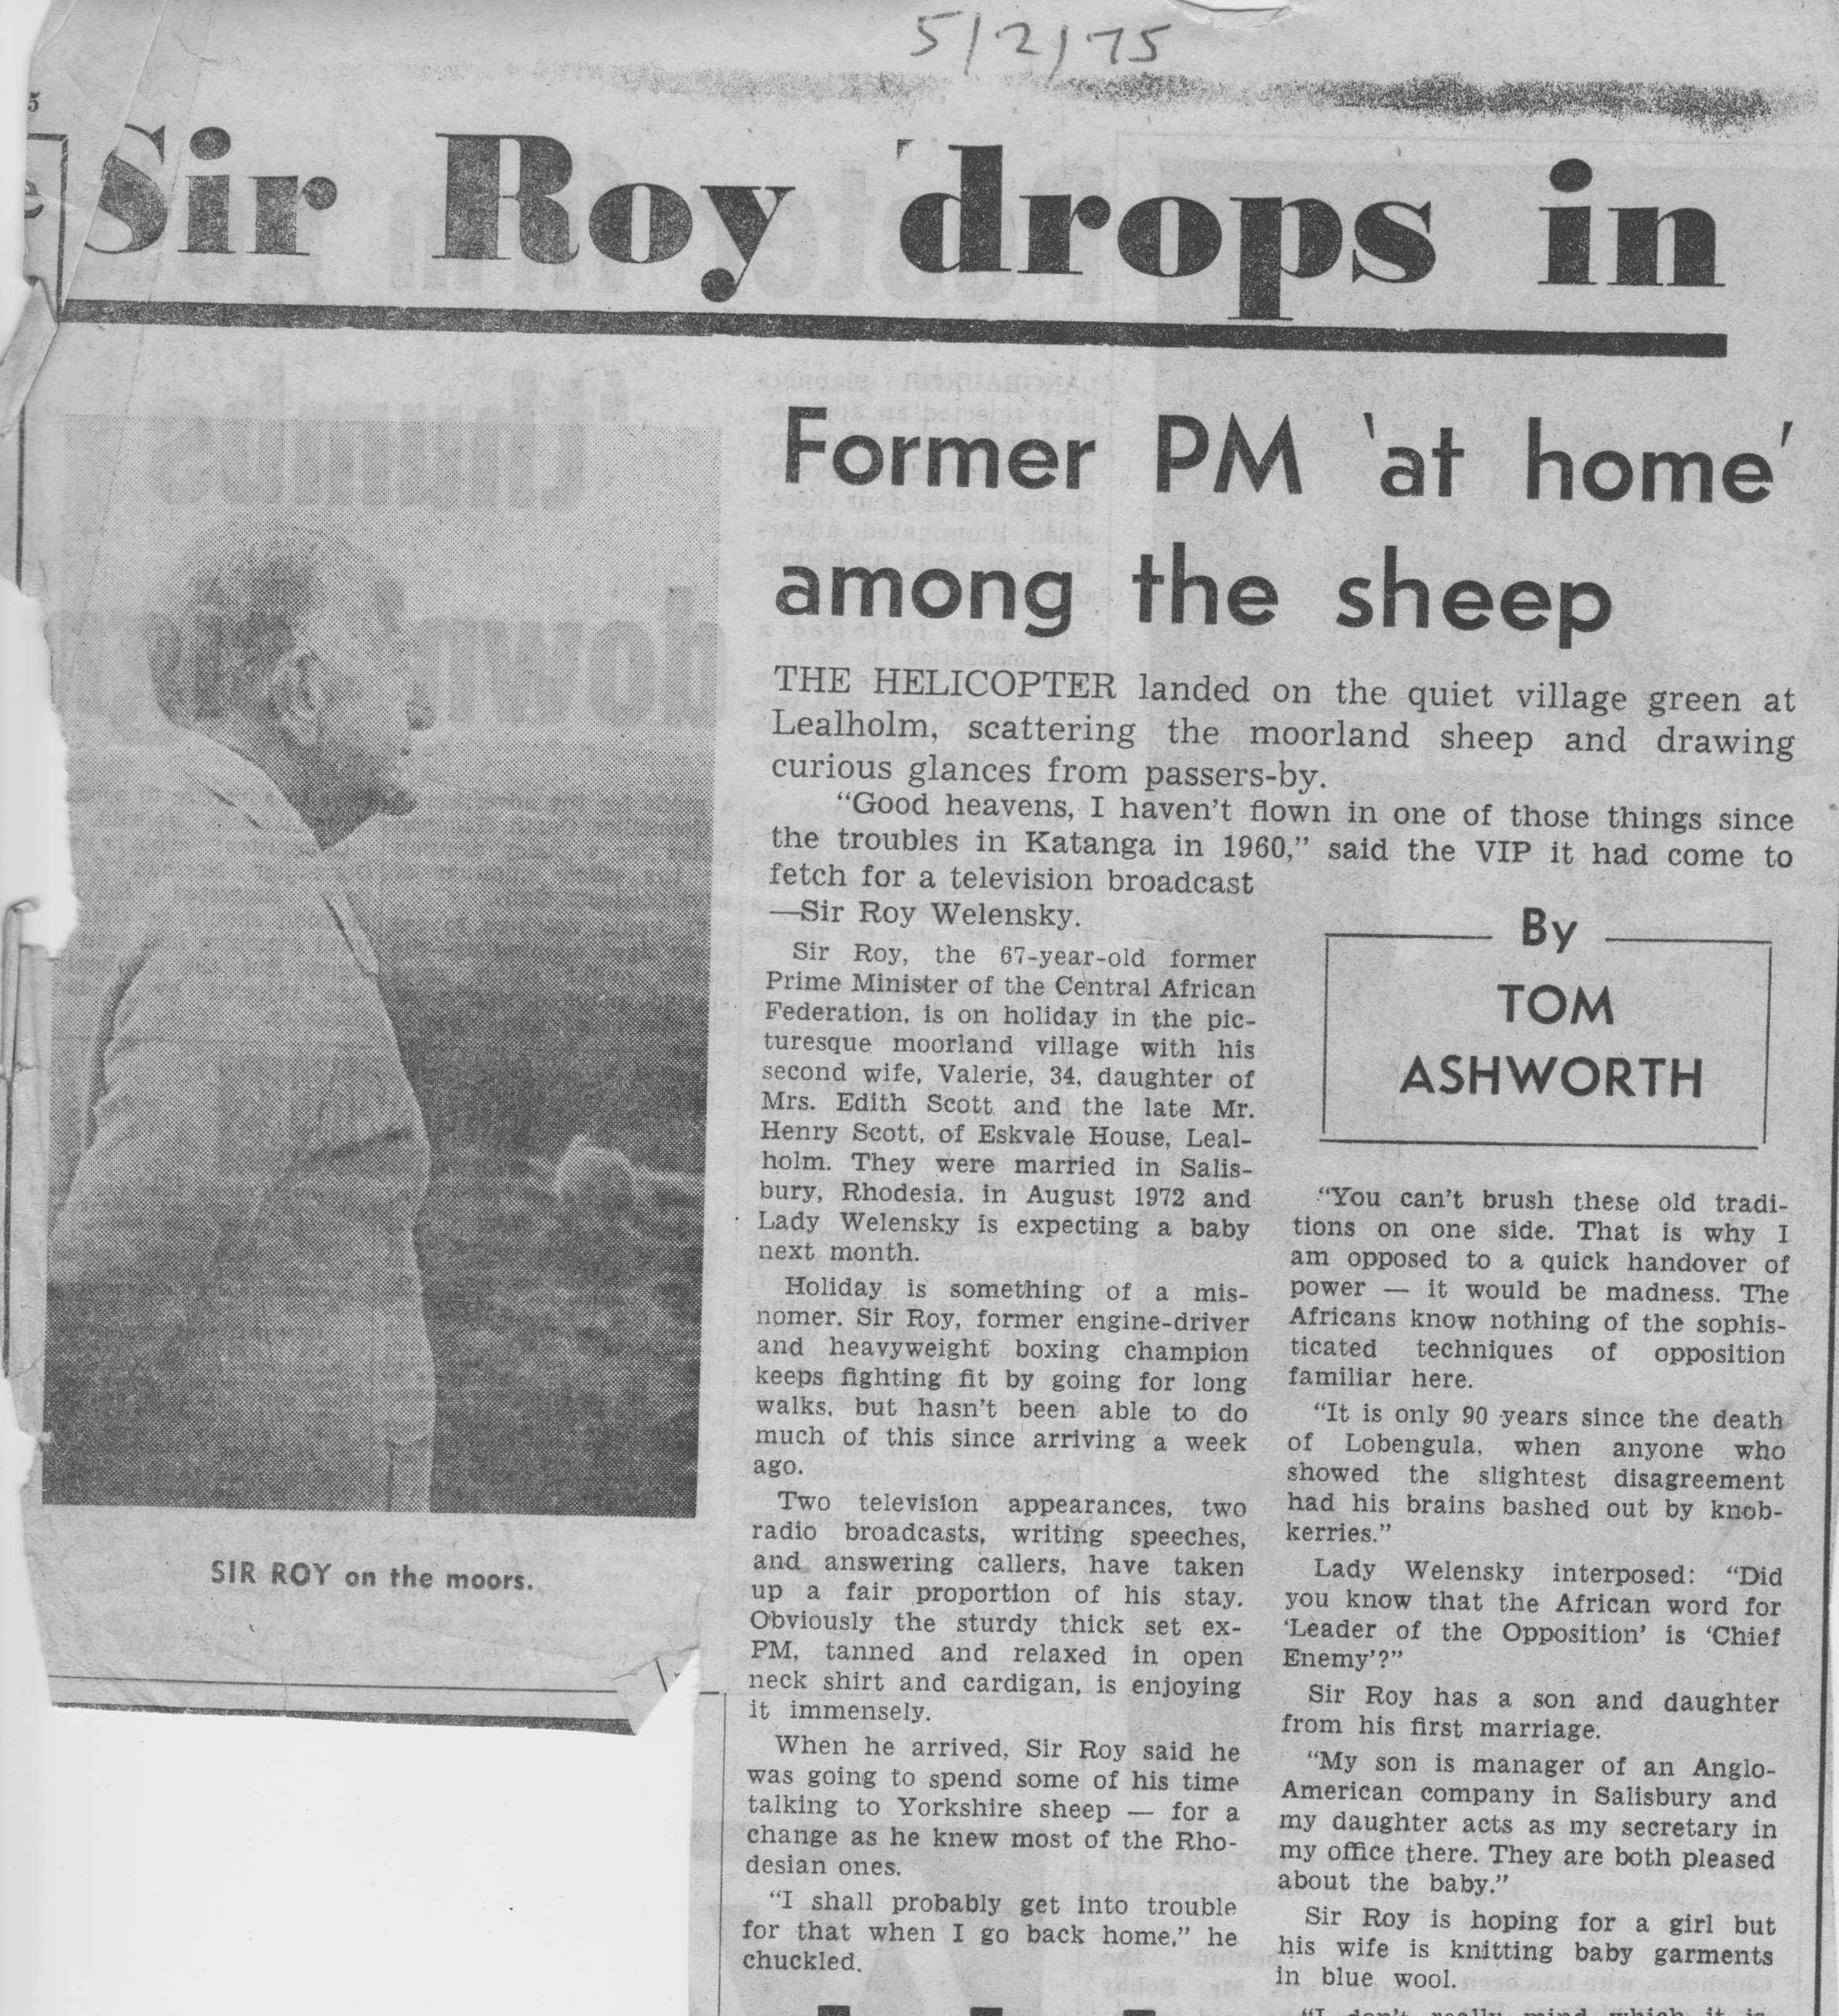 Former African Premier drops in on Lealholm 1 of 2